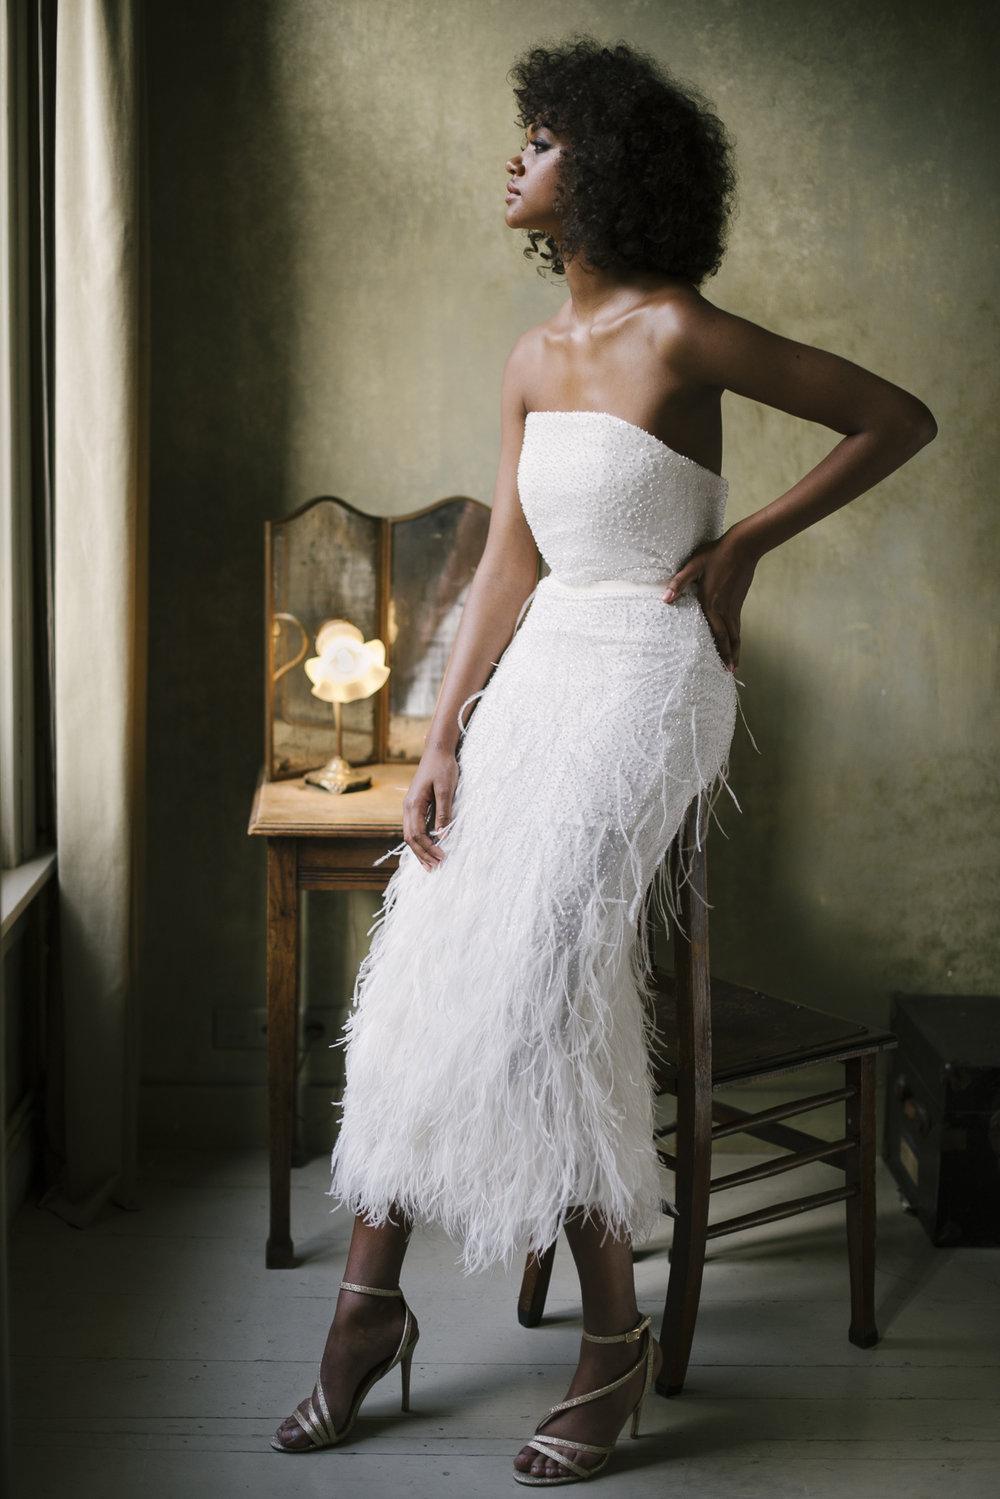 valentine-avoh-robe-mariee-ginger-wedding-dress-bruxelles-photo-elodie-timmermans-38.jpg